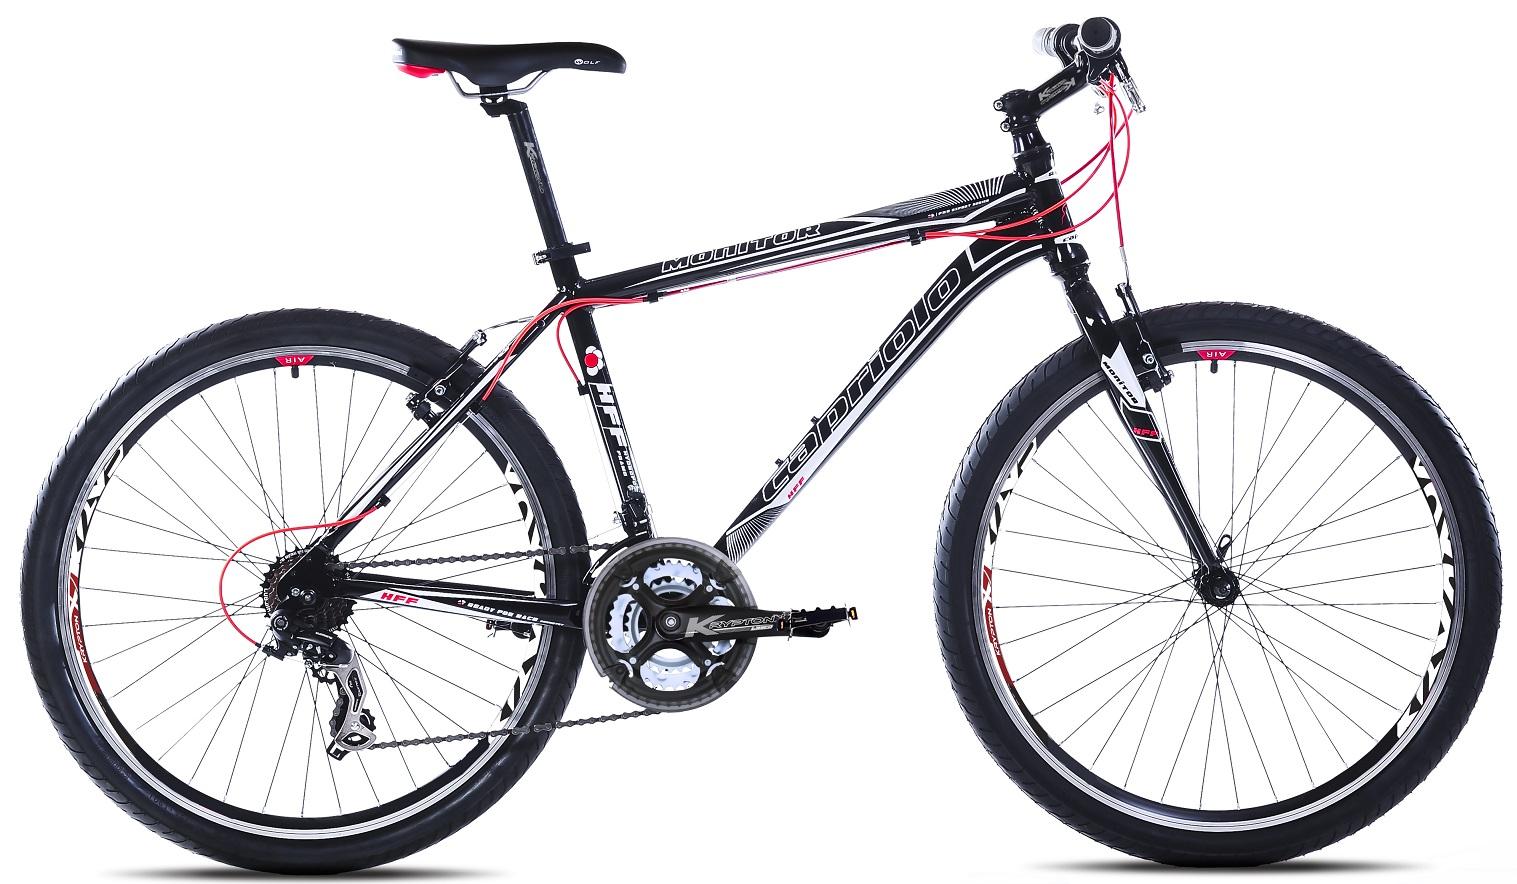 bicikl-capriolo-monitor-man-crno-belo-crvena-20